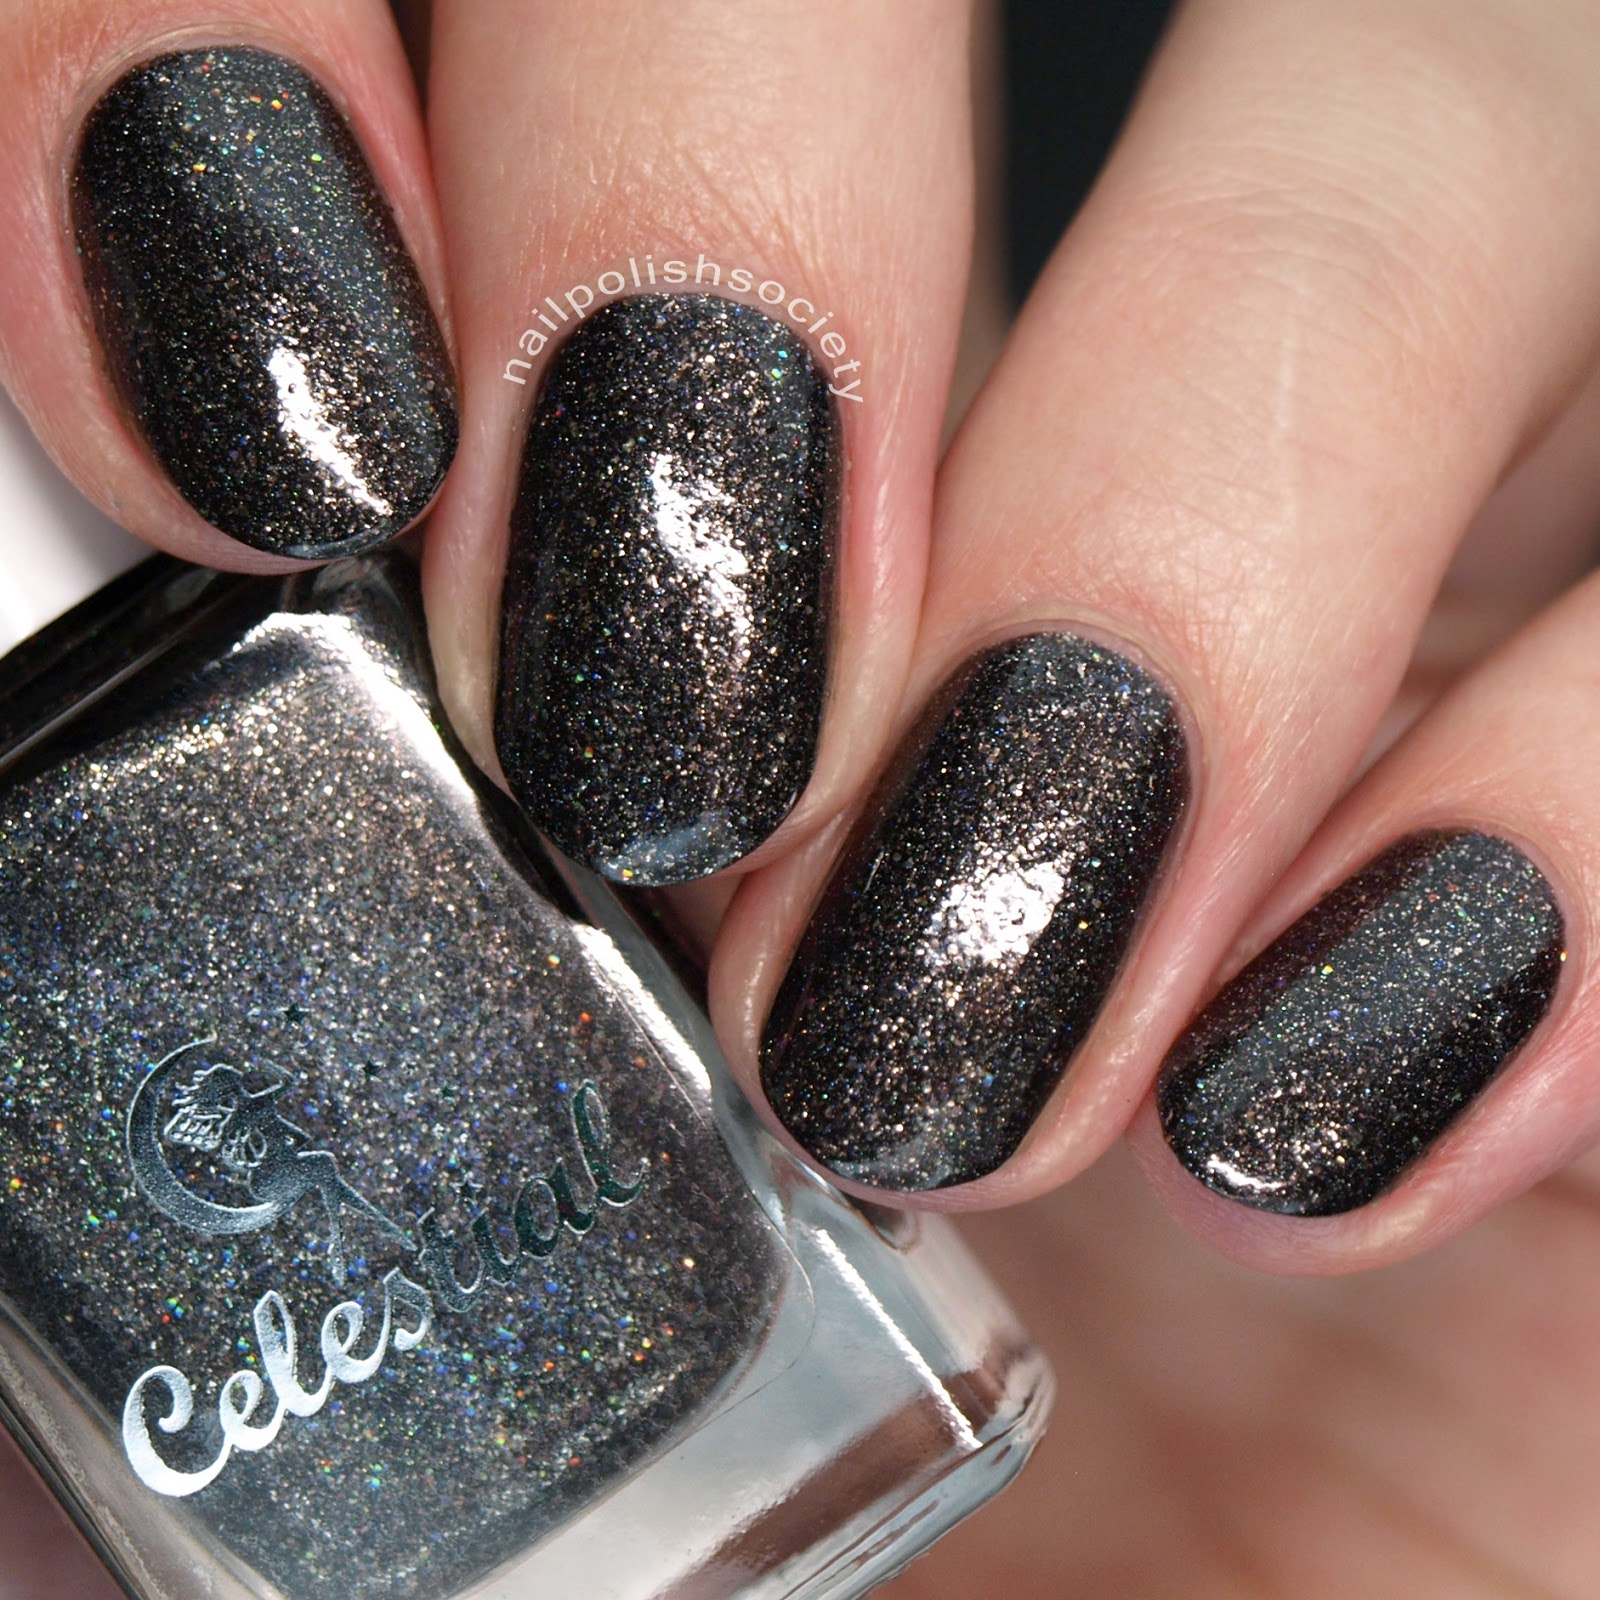 Nail Polish Society: Celestial Cosmetics The Curse of Miss Ives ...